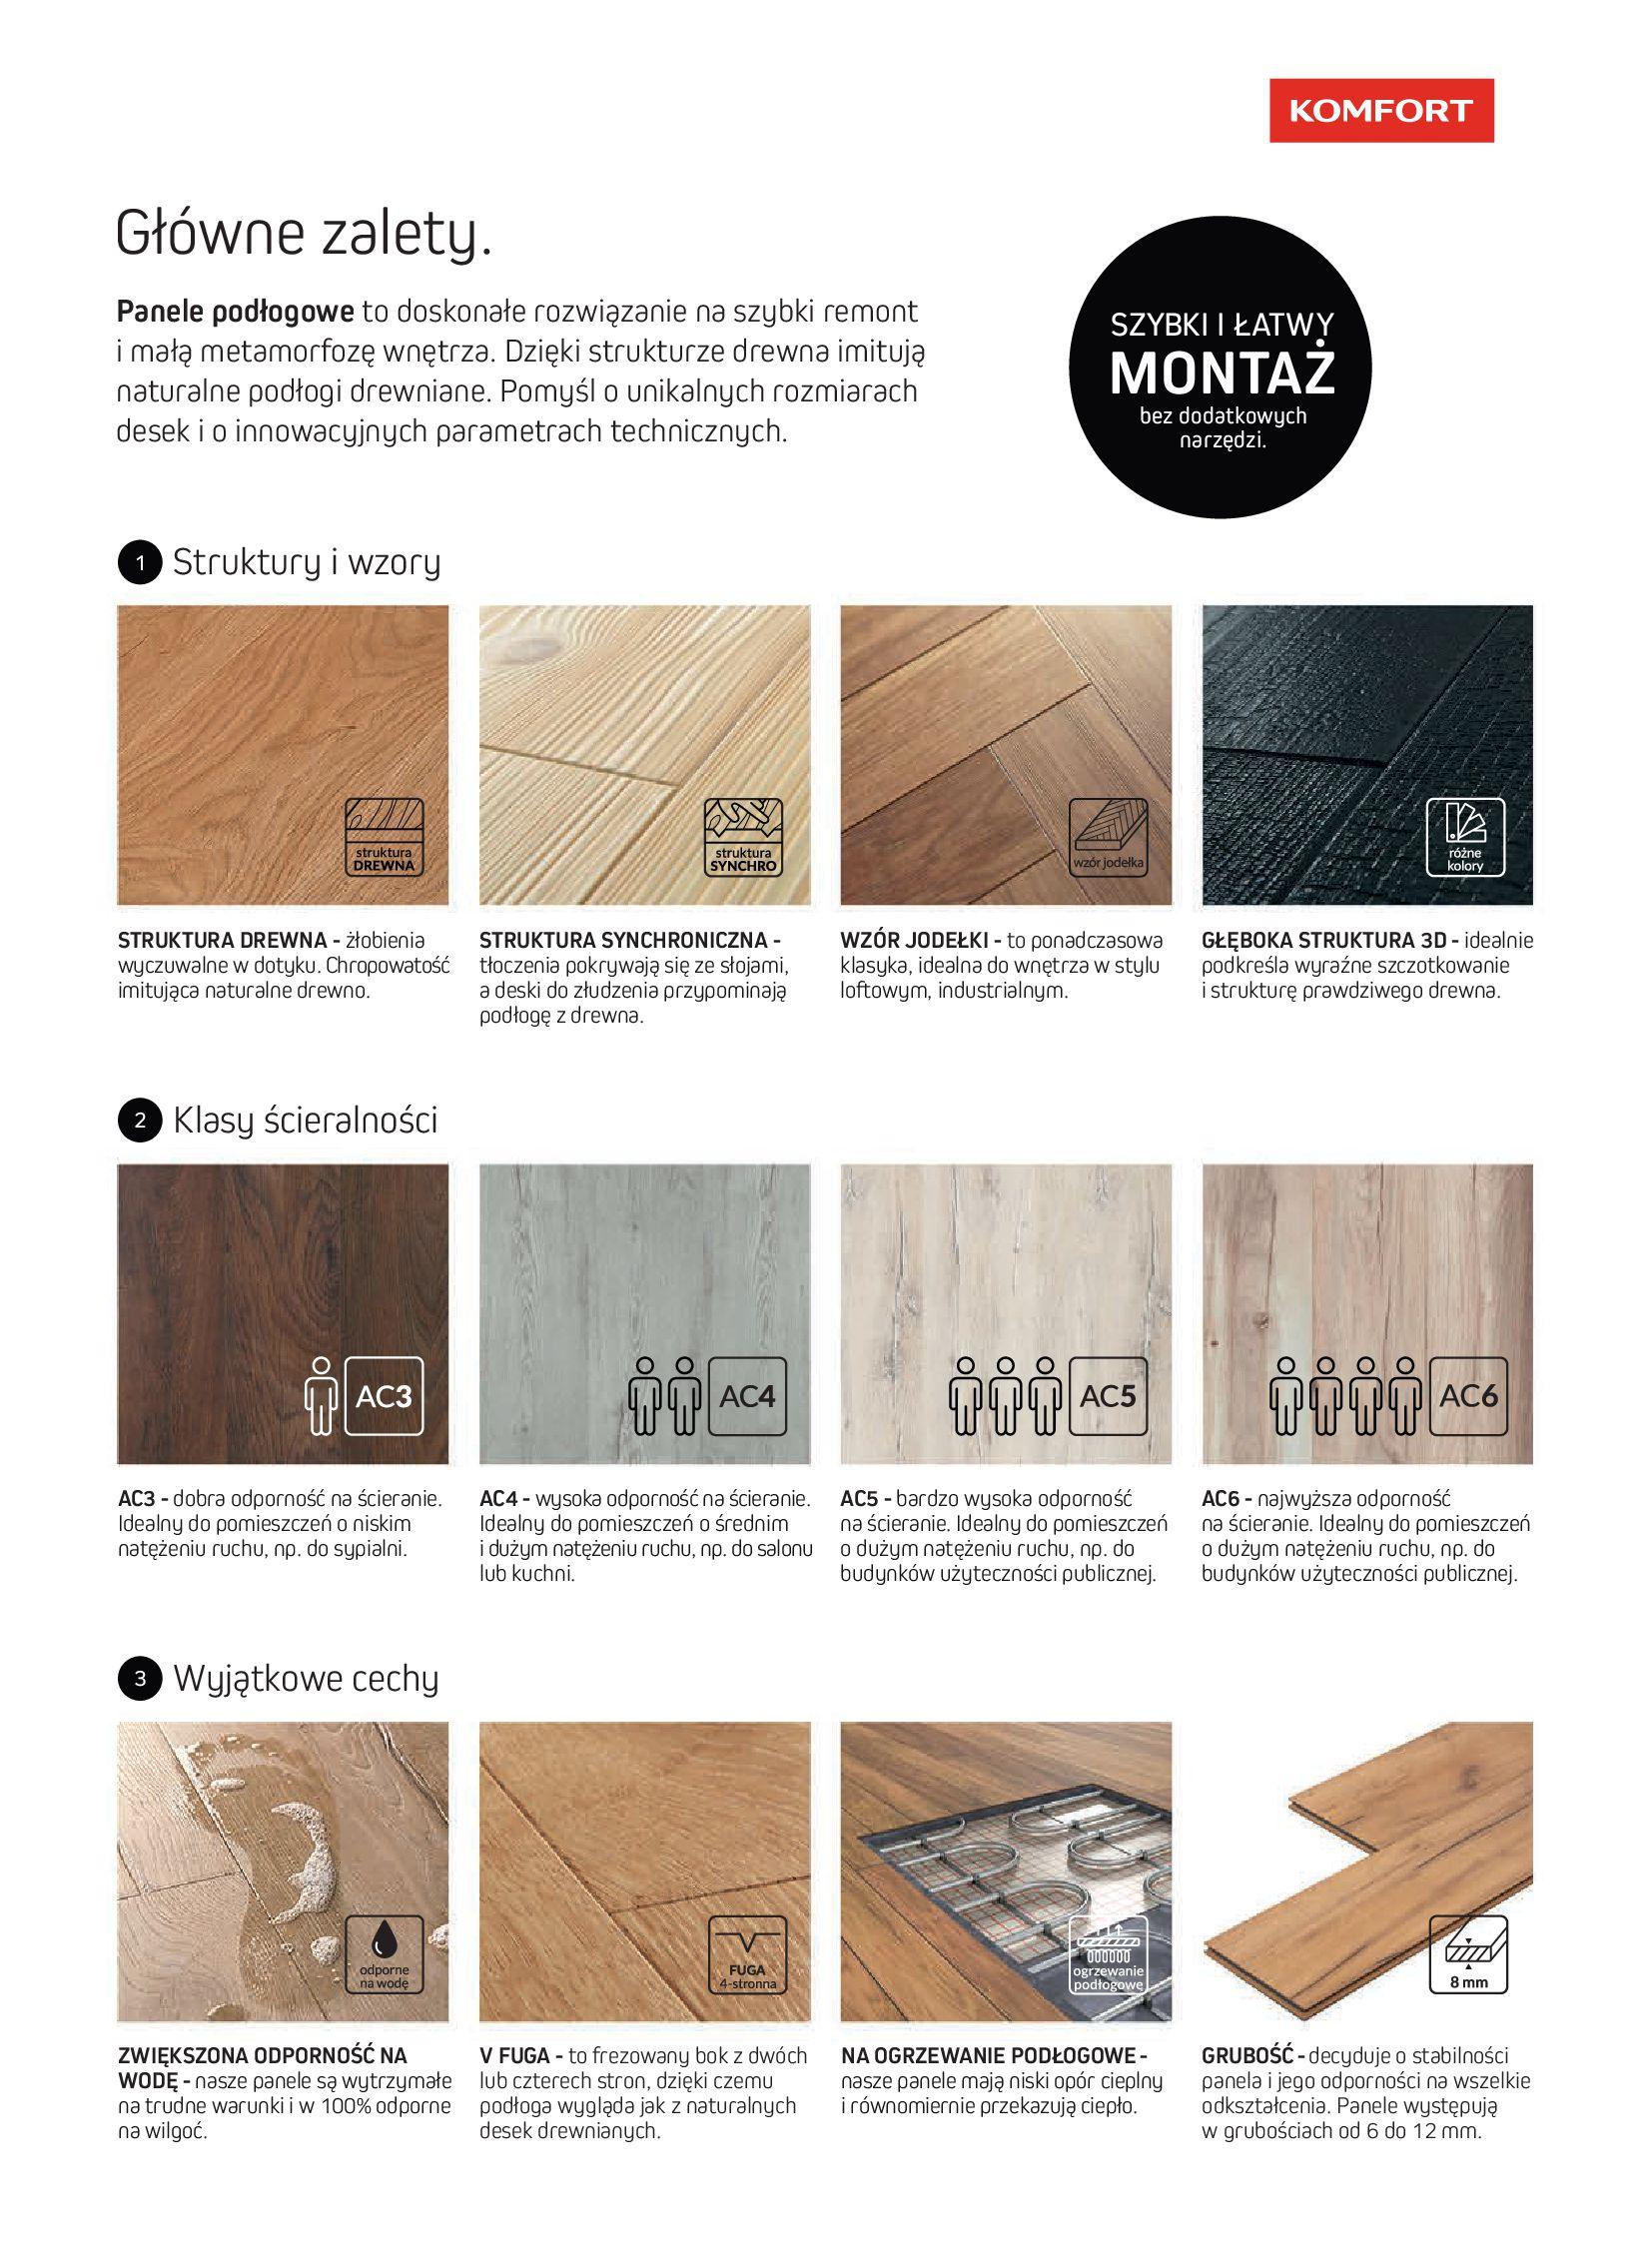 Gazetka Komfort: Gazetka Komfort - Katalog podłogi i drzwi 2021-06-16 page-23